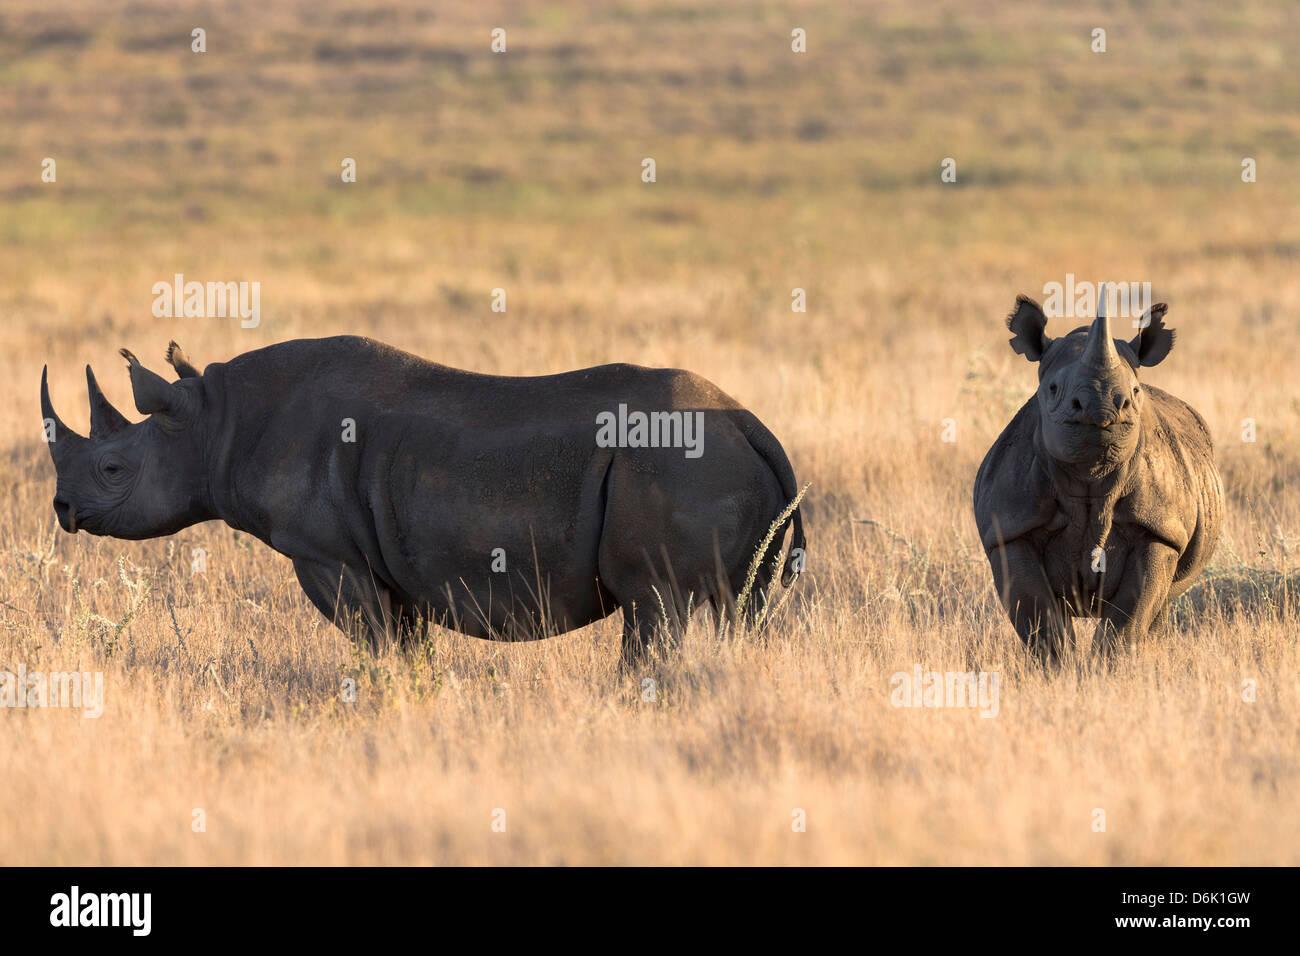 Black rhinos (Diceros bicornis), Lewa Wildlife Conservancy, Laikipia, Kenya, East Africa, Africa - Stock Image